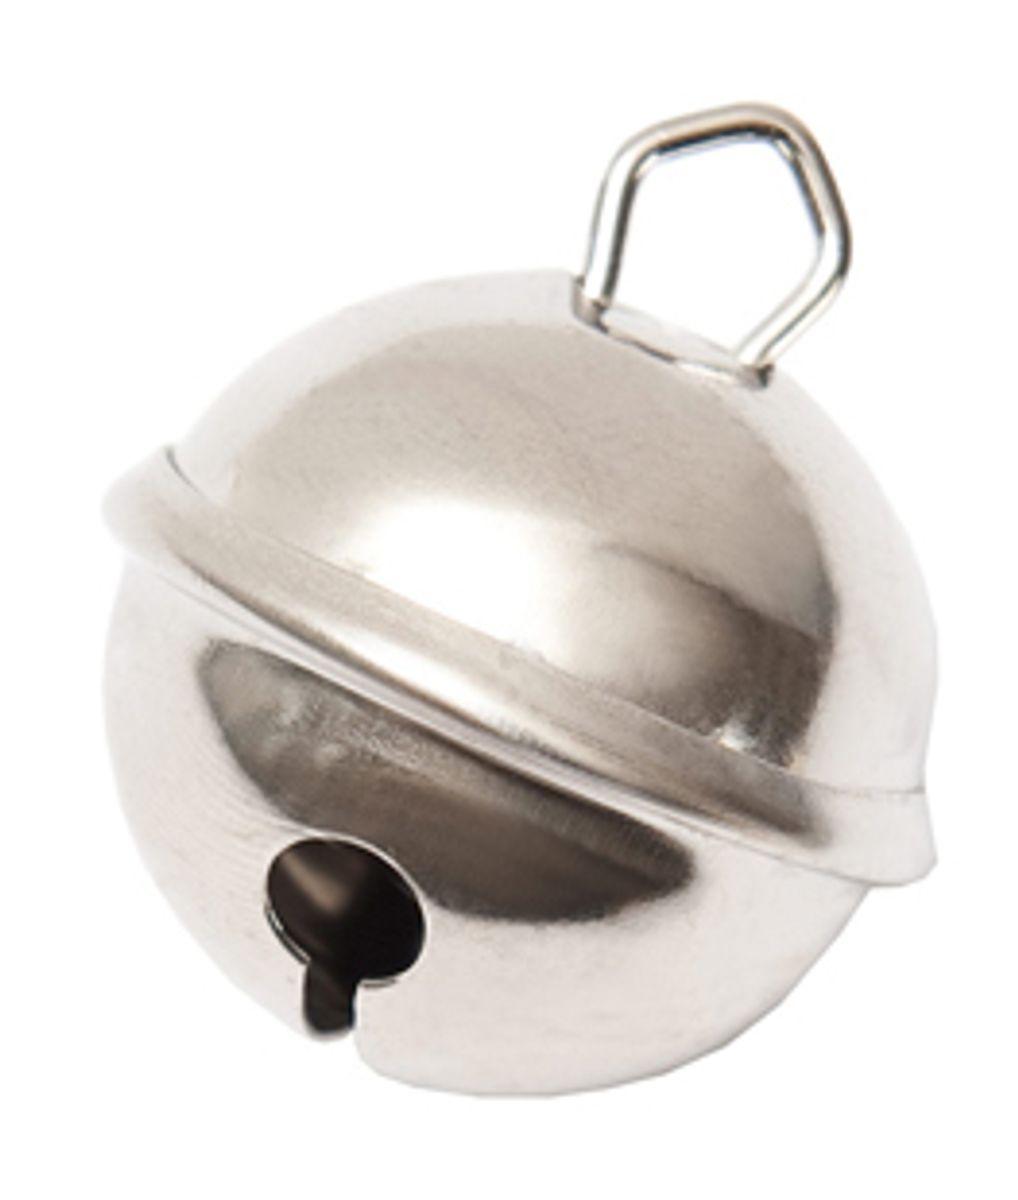 Grelots argent - 22 mm